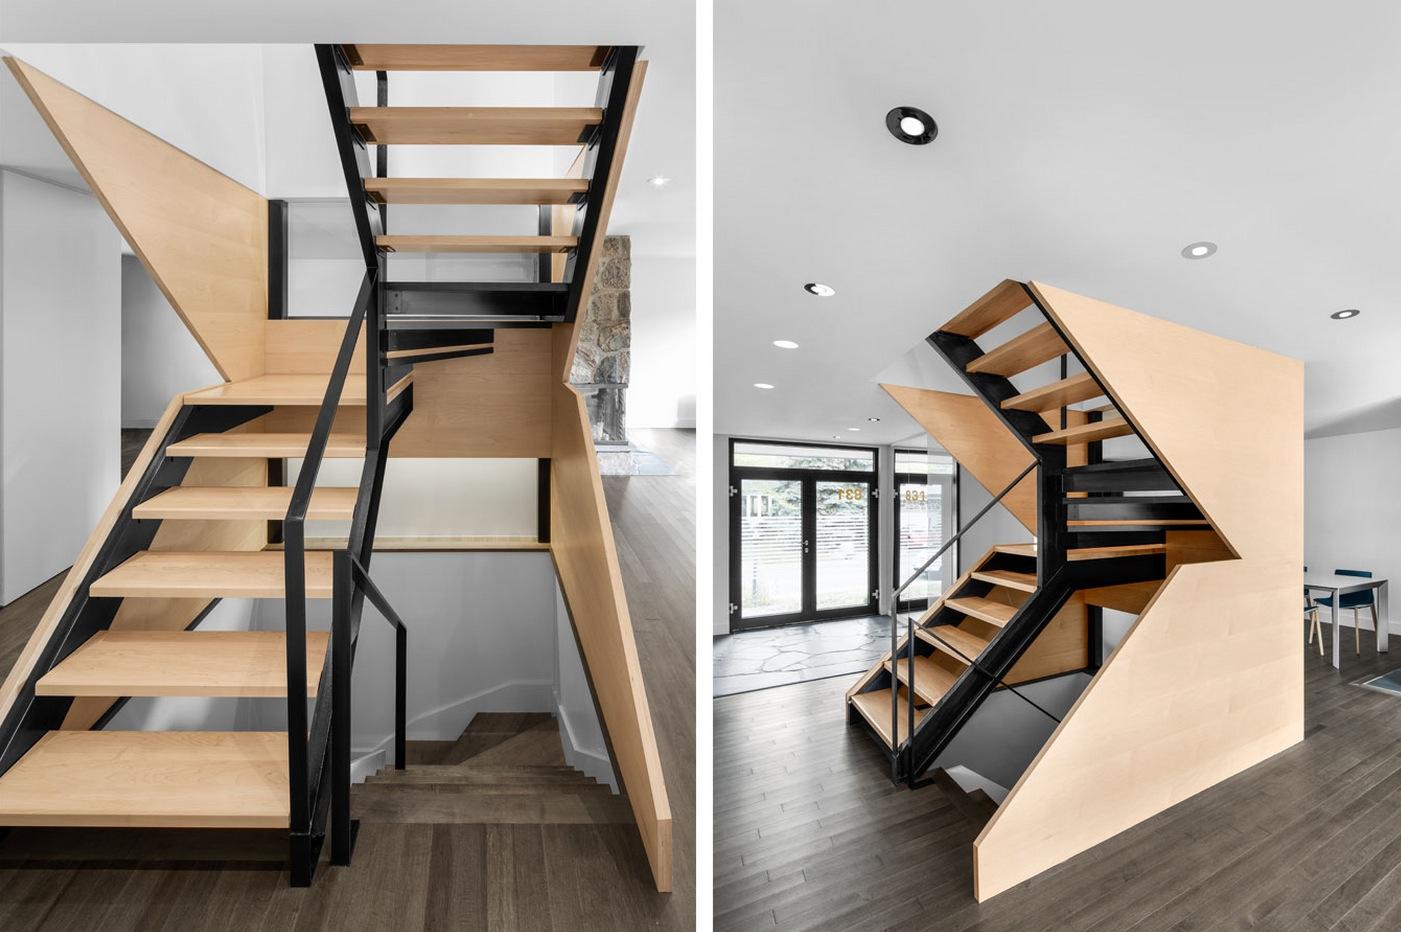 Residence-Closse-naturehumaine-design-07